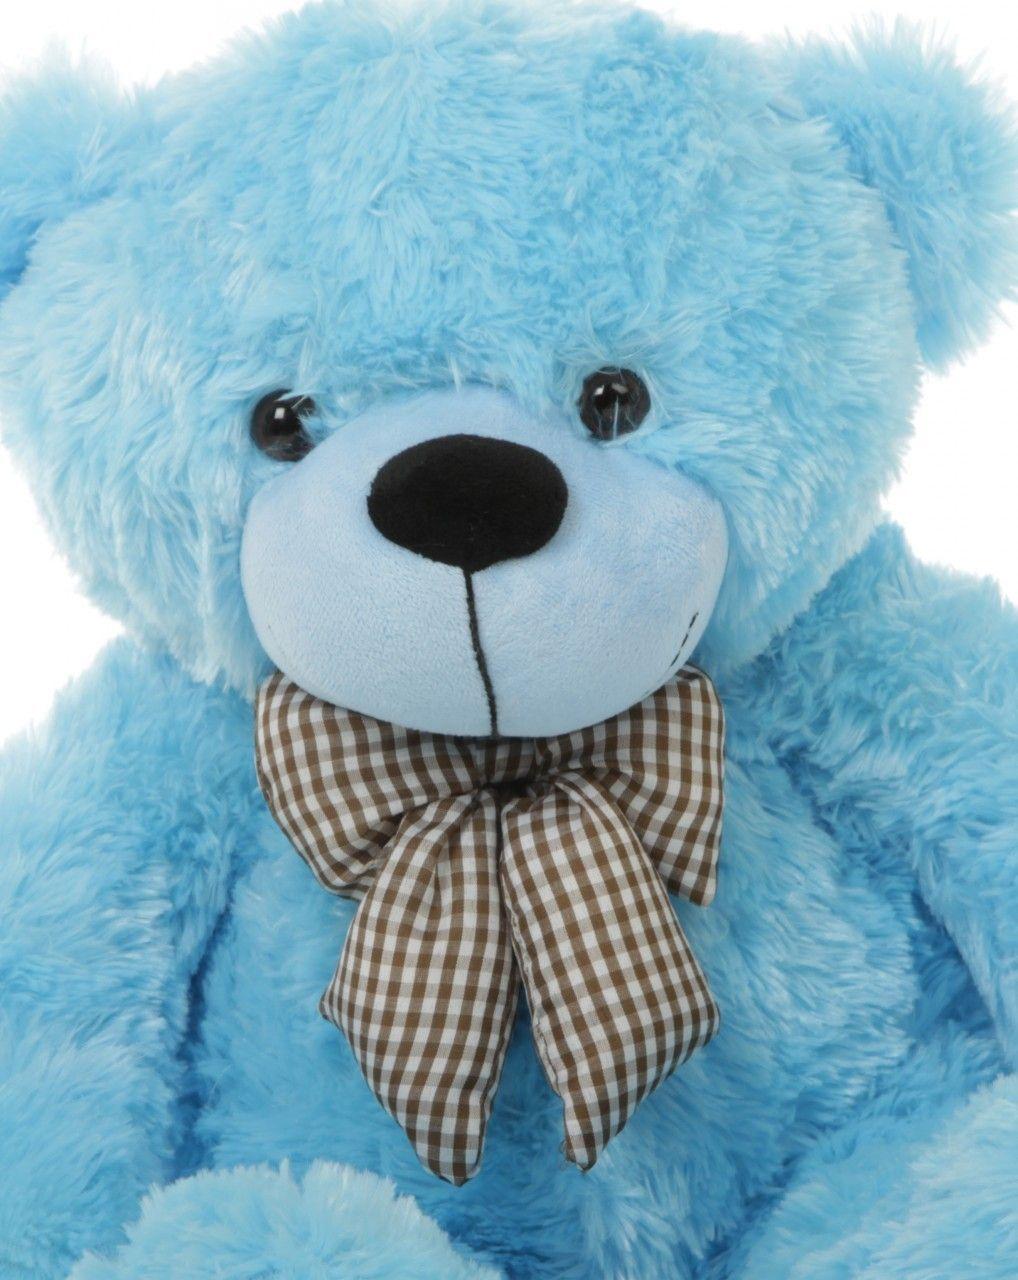 Happy Cuddles Adorable Blue Teddy Bear 26in 39 99 Http Www Giantteddy Com Blue Teddy Bear Teddy Bear Teddy [ 1280 x 1018 Pixel ]